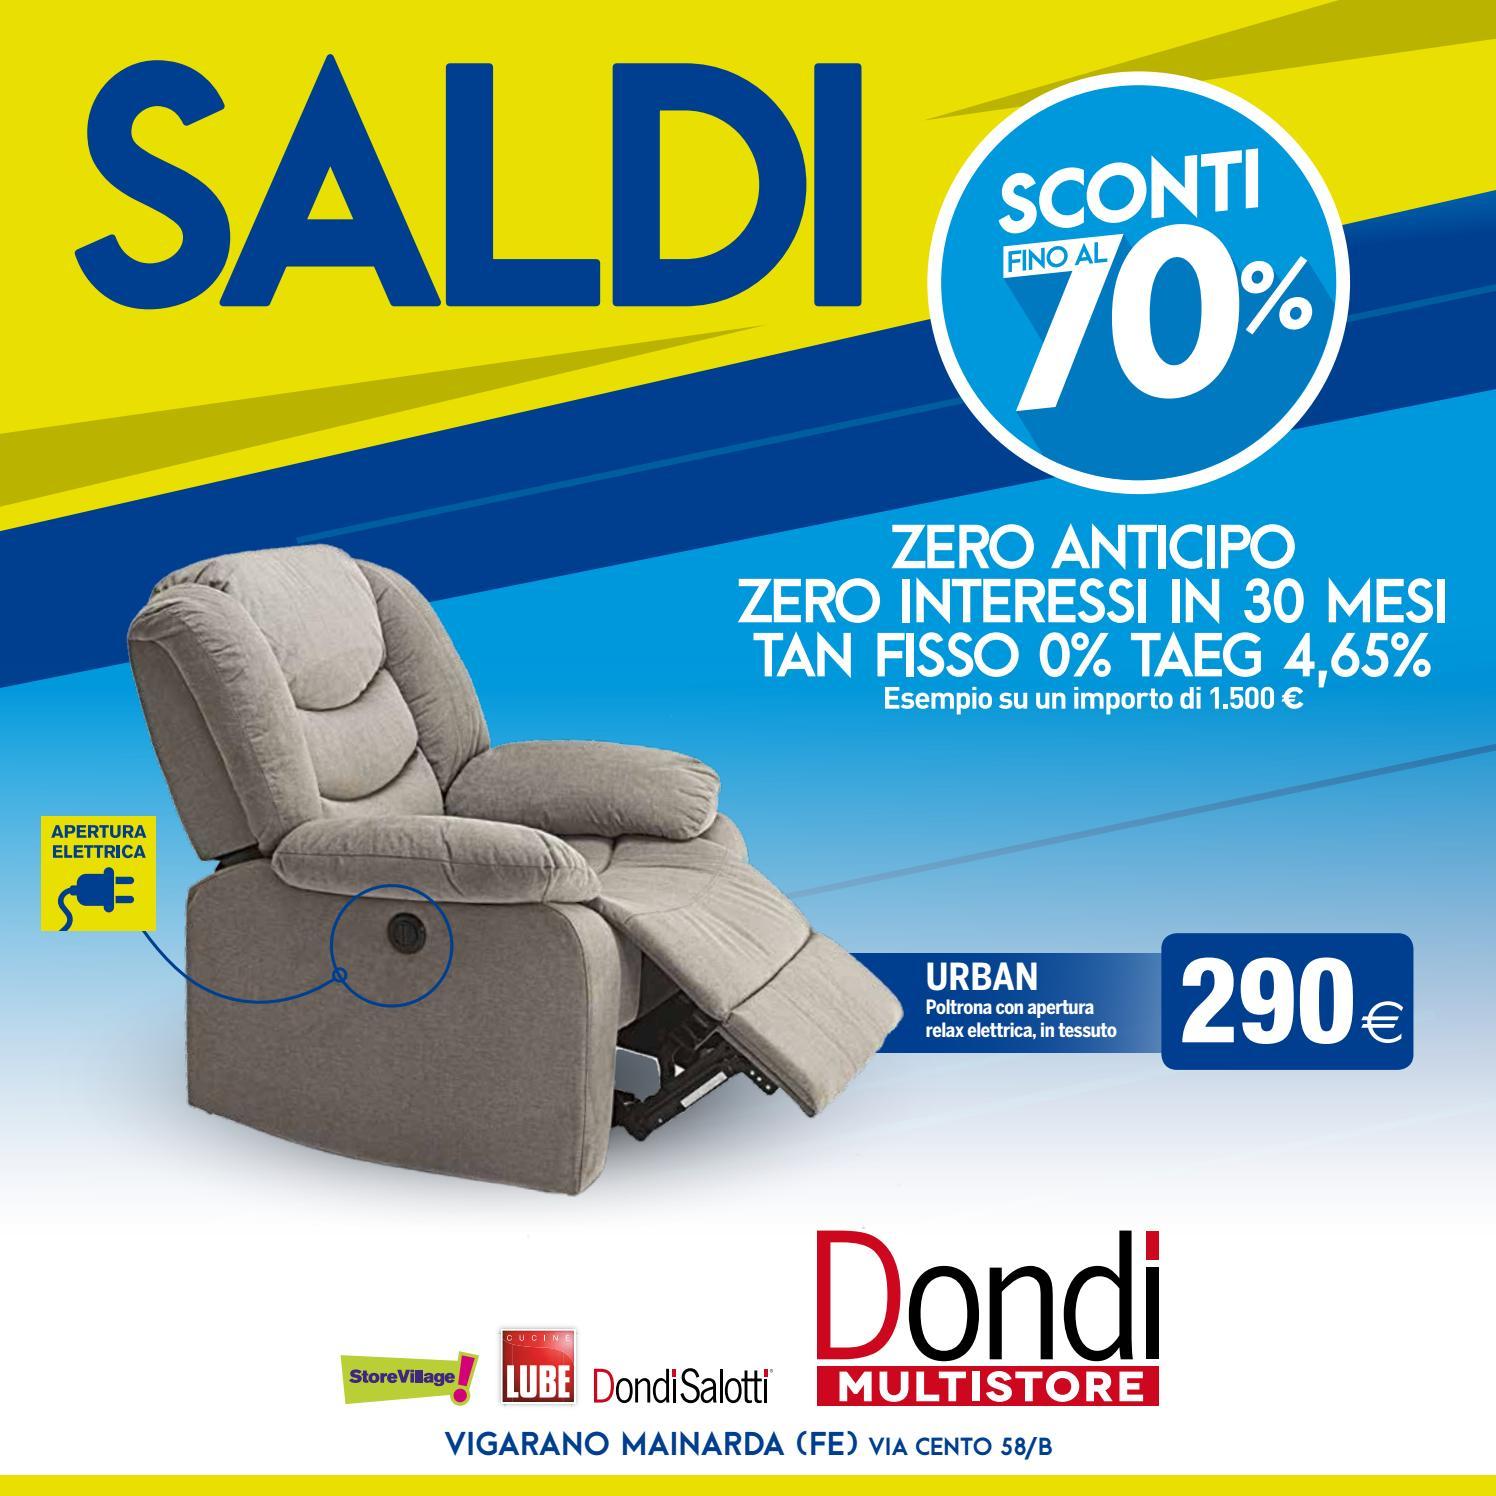 Dondi Salotti Saldi 2018 - Vigarano by Michele Travagli - issuu